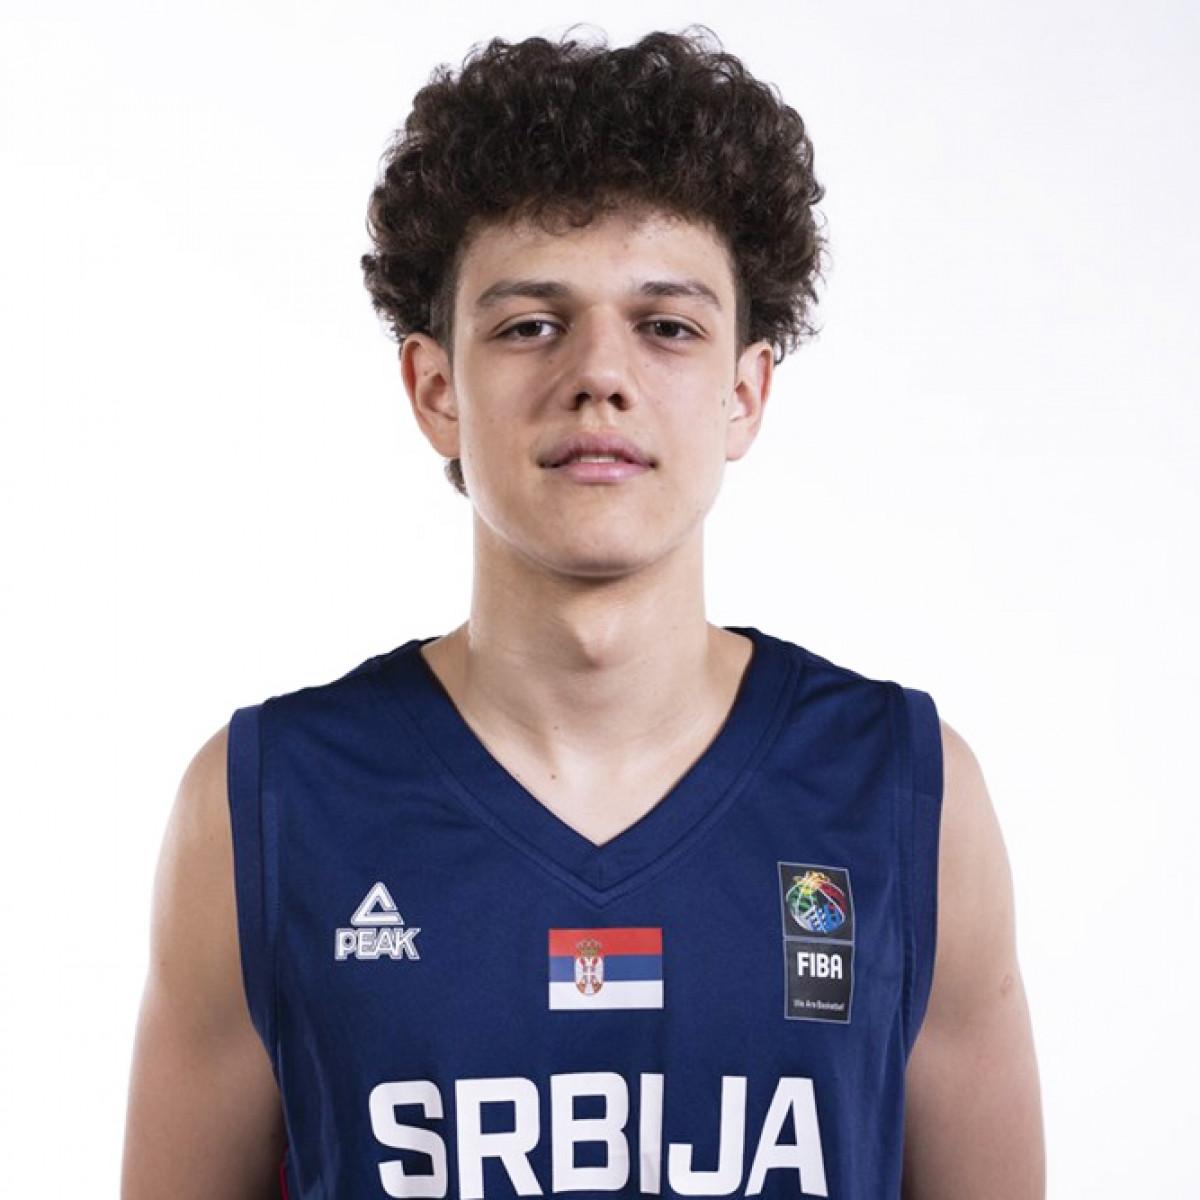 Photo of Uros Trifunovic, 2019-2020 season